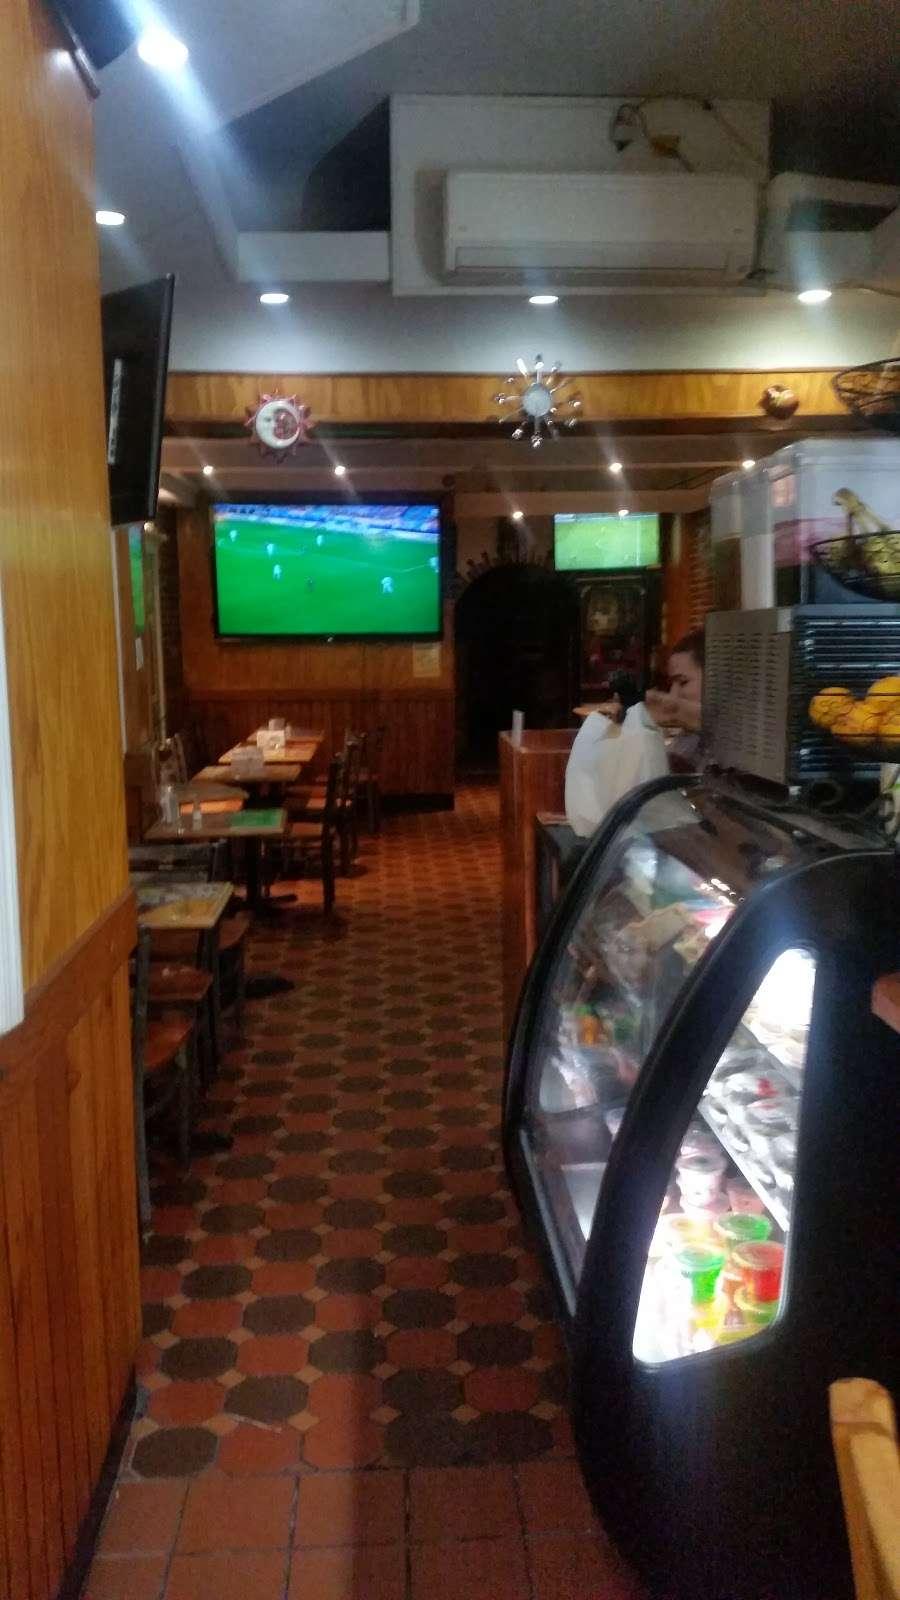 Athens - restaurant    Photo 4 of 8   Address: 30-11 30th Ave, Long Island City, NY 11102, USA   Phone: (718) 777-5366